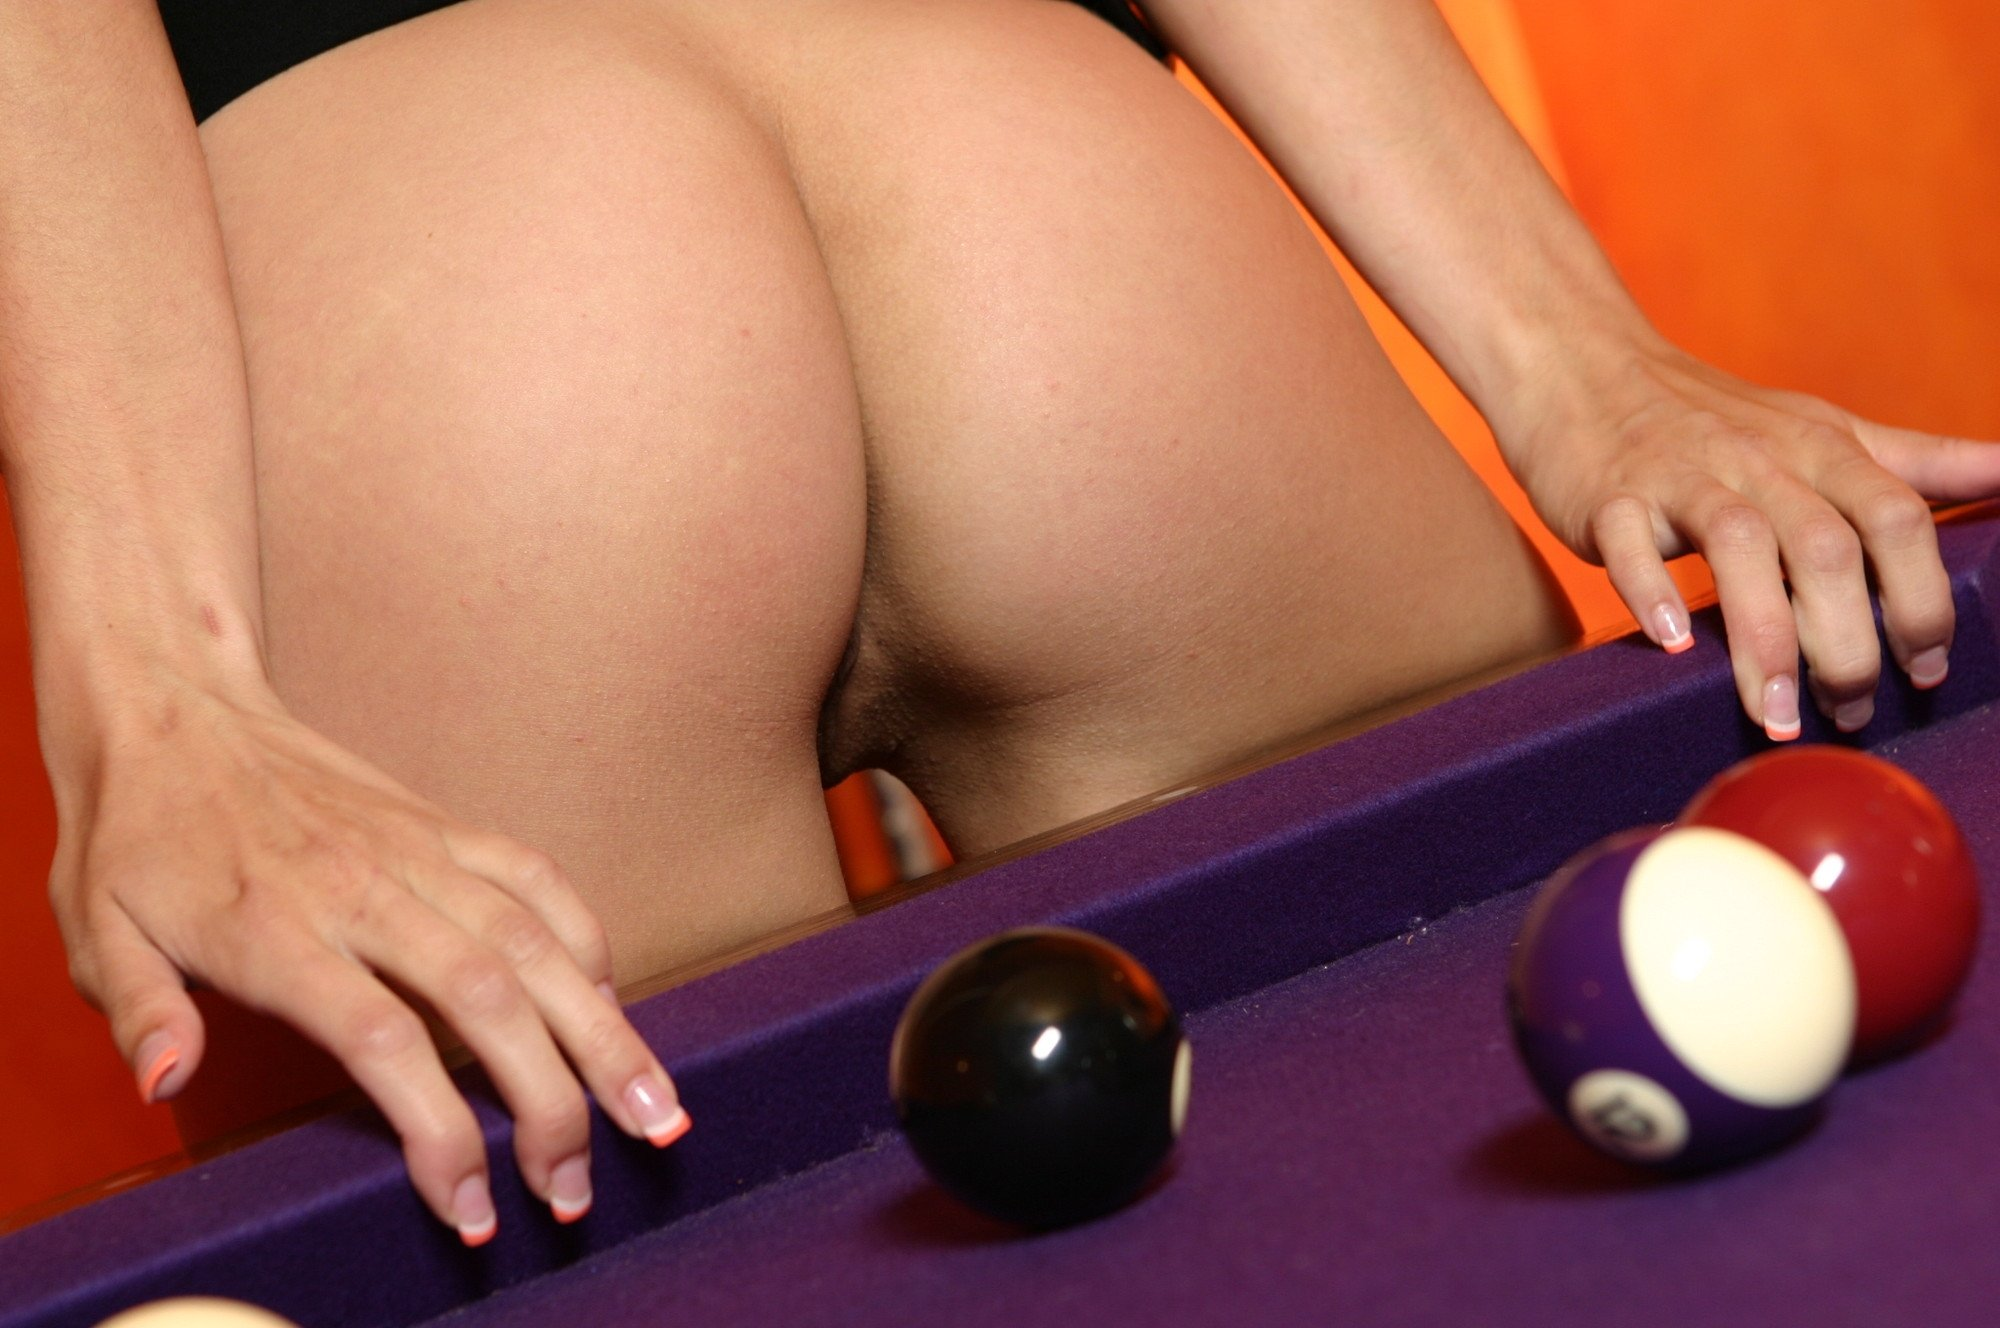 Pool Table Porn Xxx